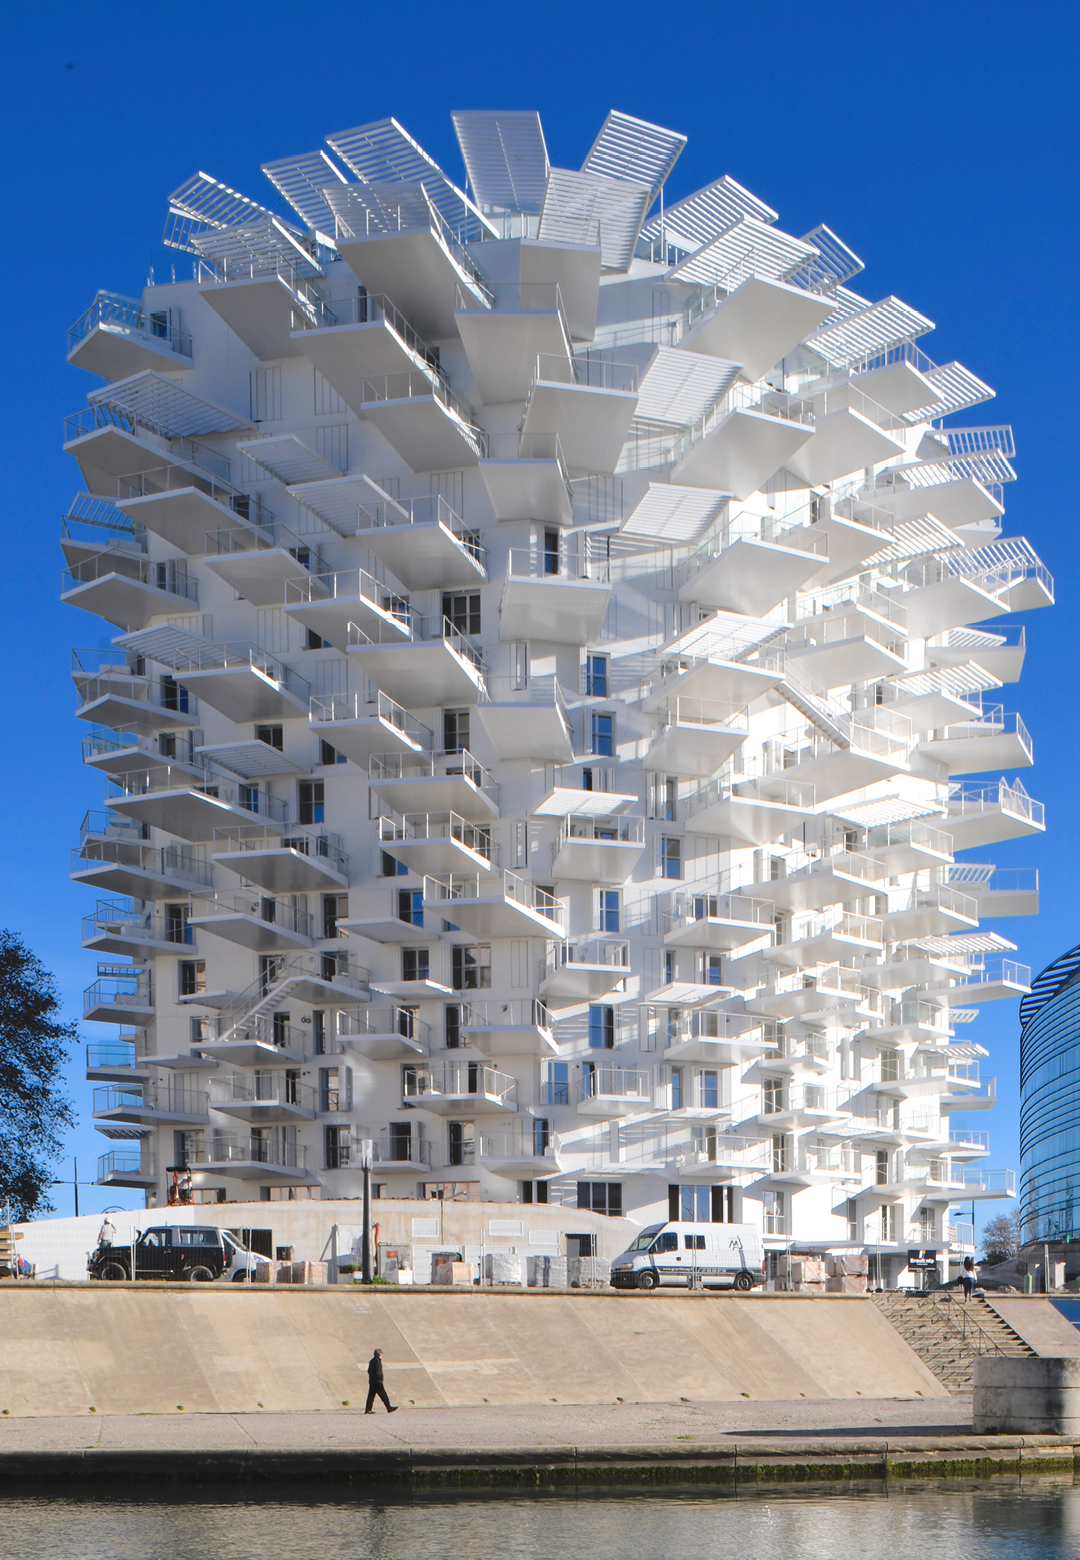 A view of the tower L'Arbre Blanc| Nicolas Laisné, Manal Rachdi, Sou Fujimoto| STIR